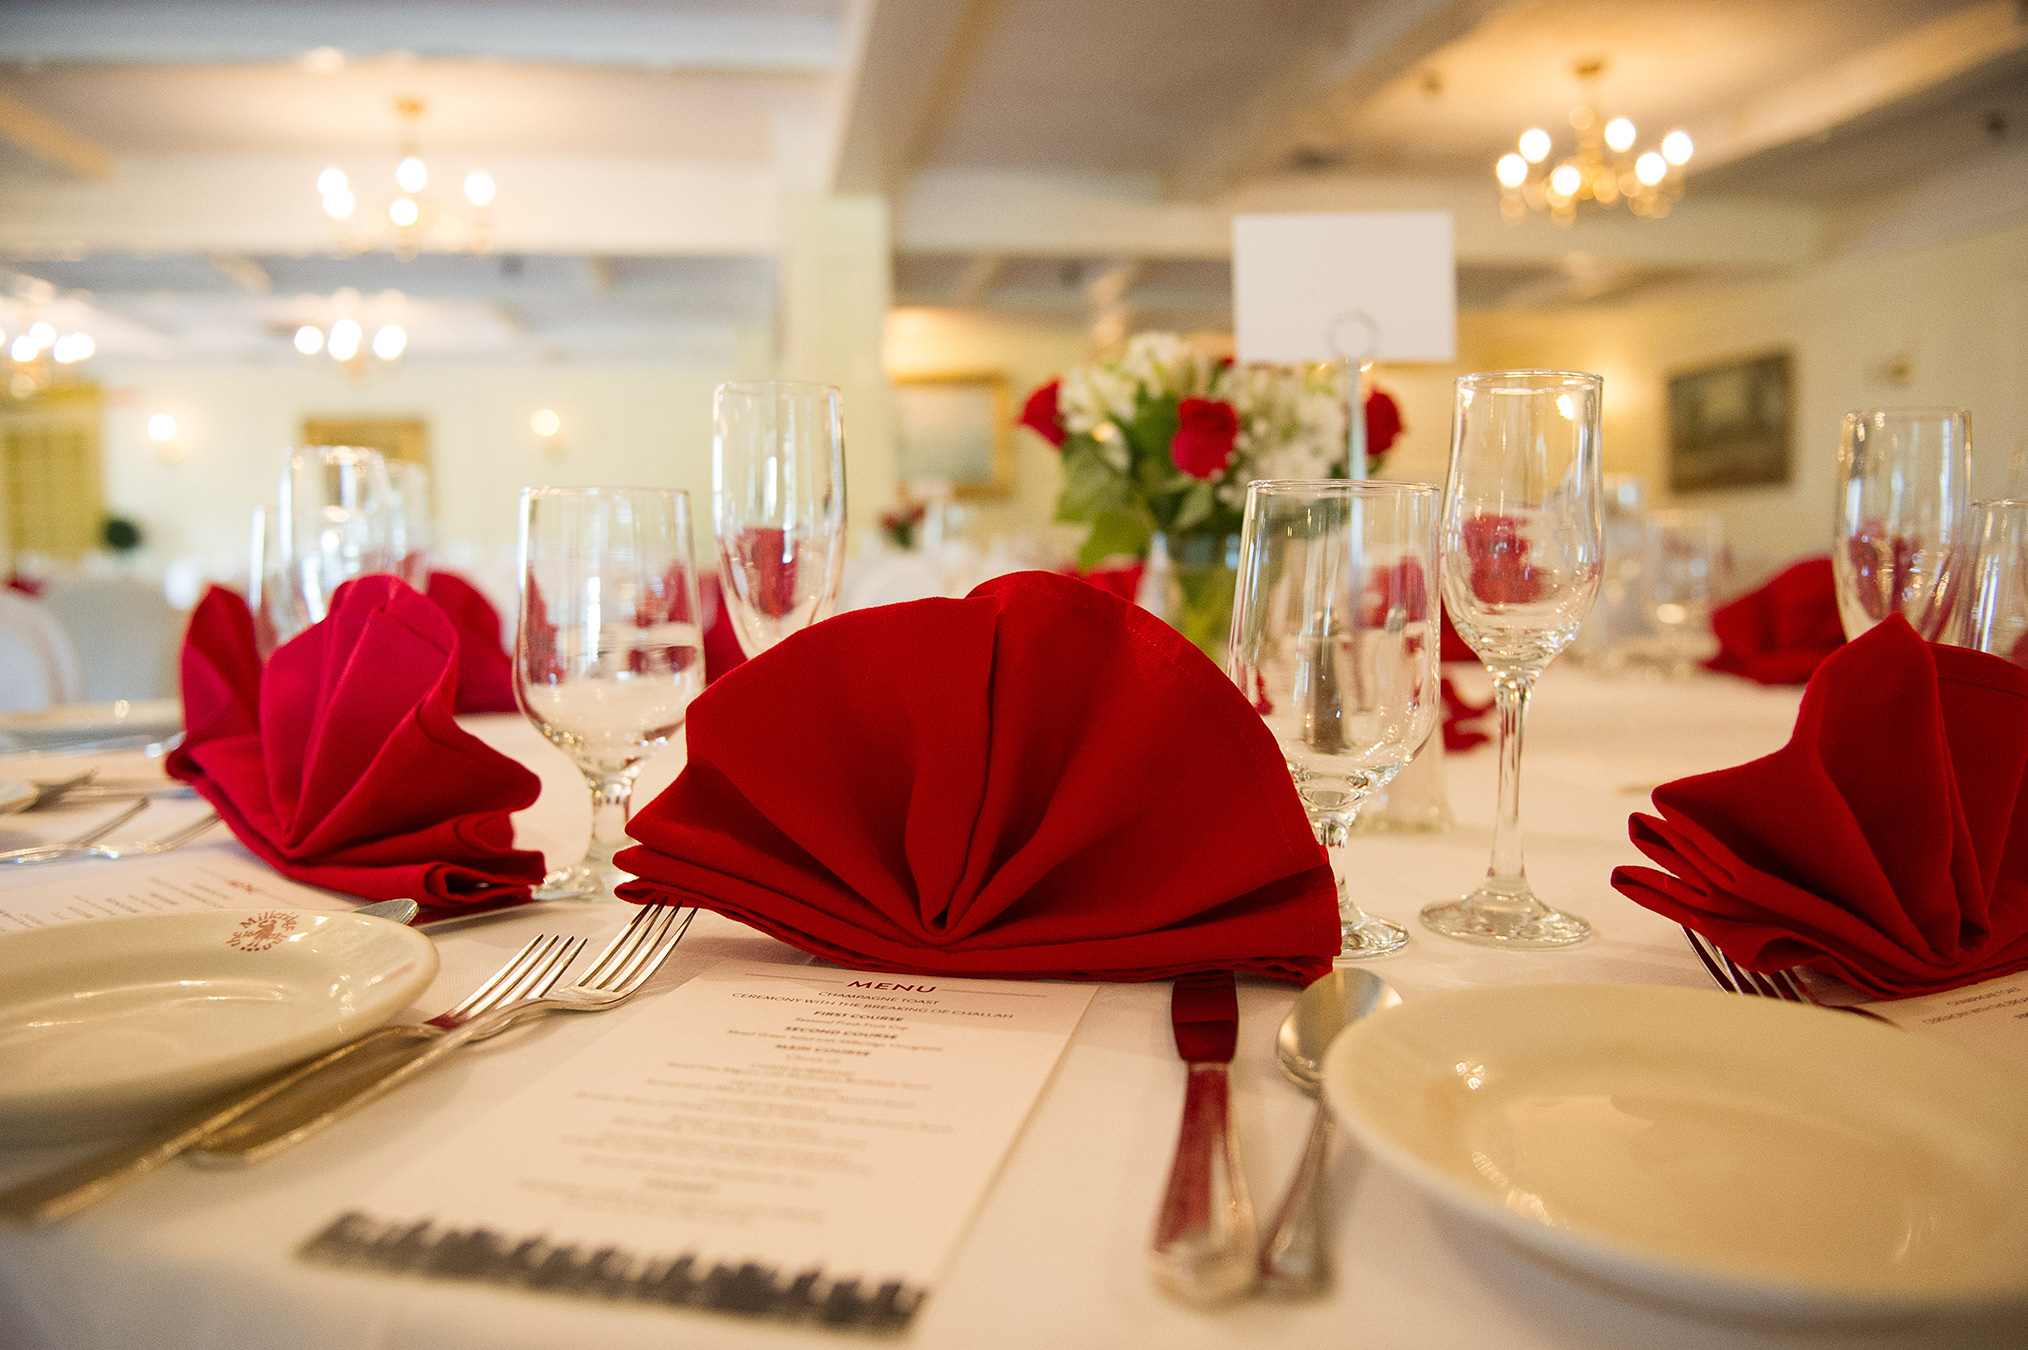 eventdesign_wedding_image21